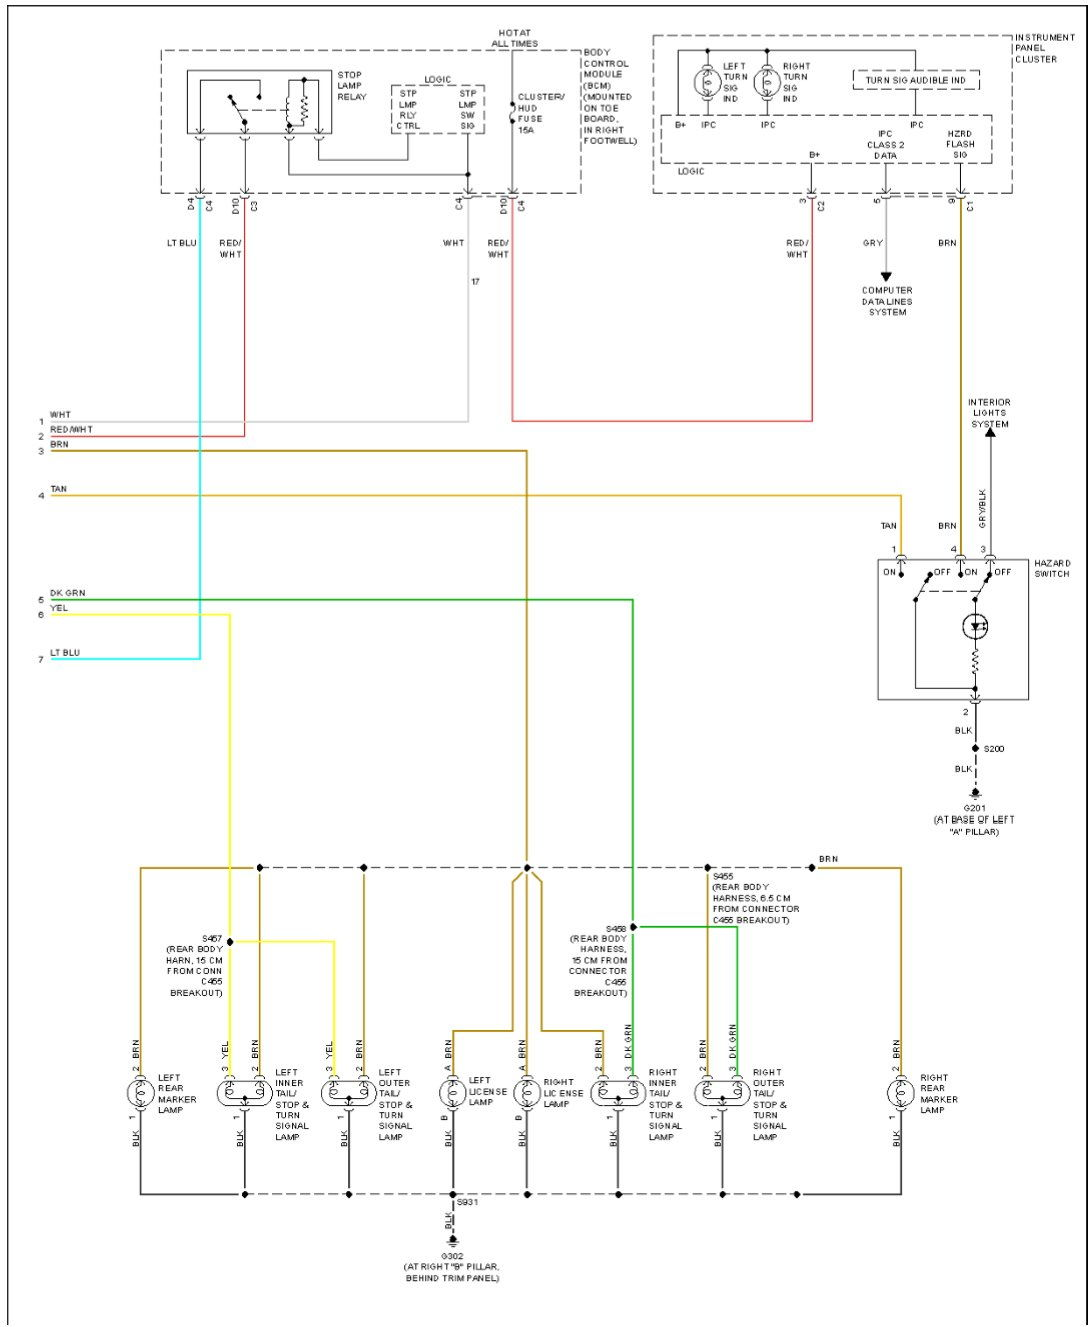 tail light wiring diagram chevy 1979 pontiac firebird trans am 2006 needed corvetteforum